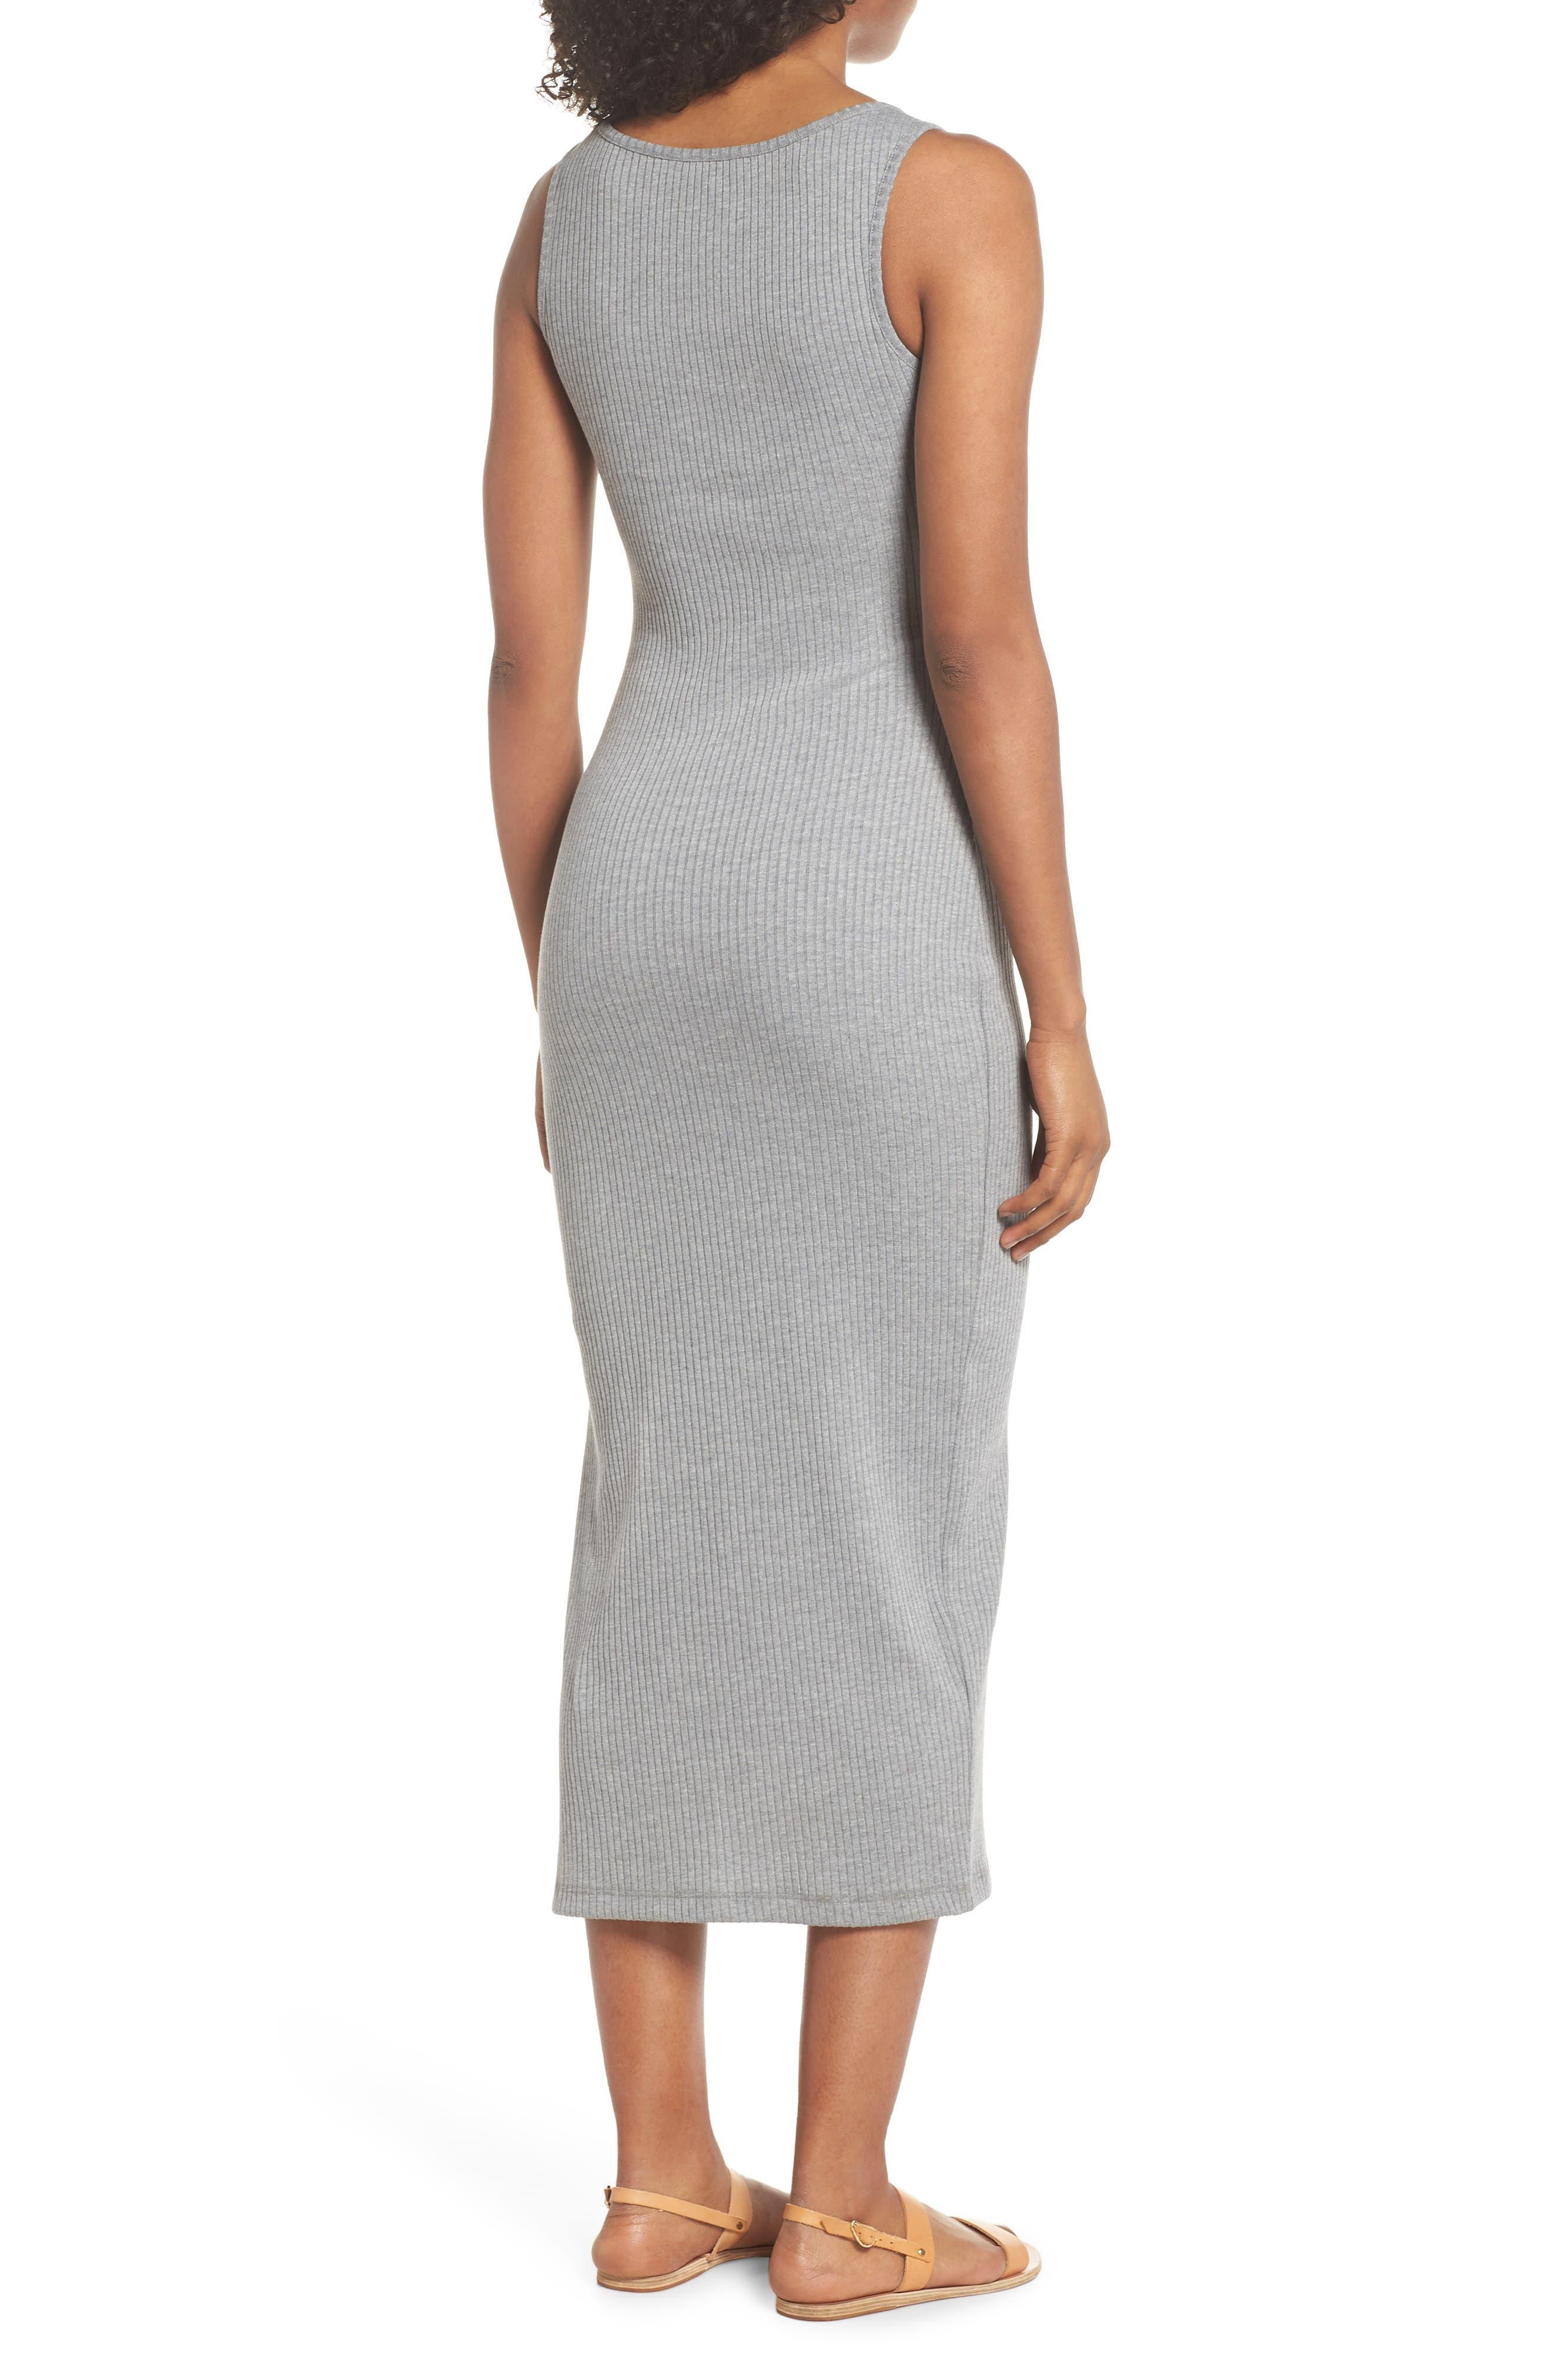 Tommy Rib Knit Tank Dress,                             Alternate thumbnail 2, color,                             Mid Grey Mel